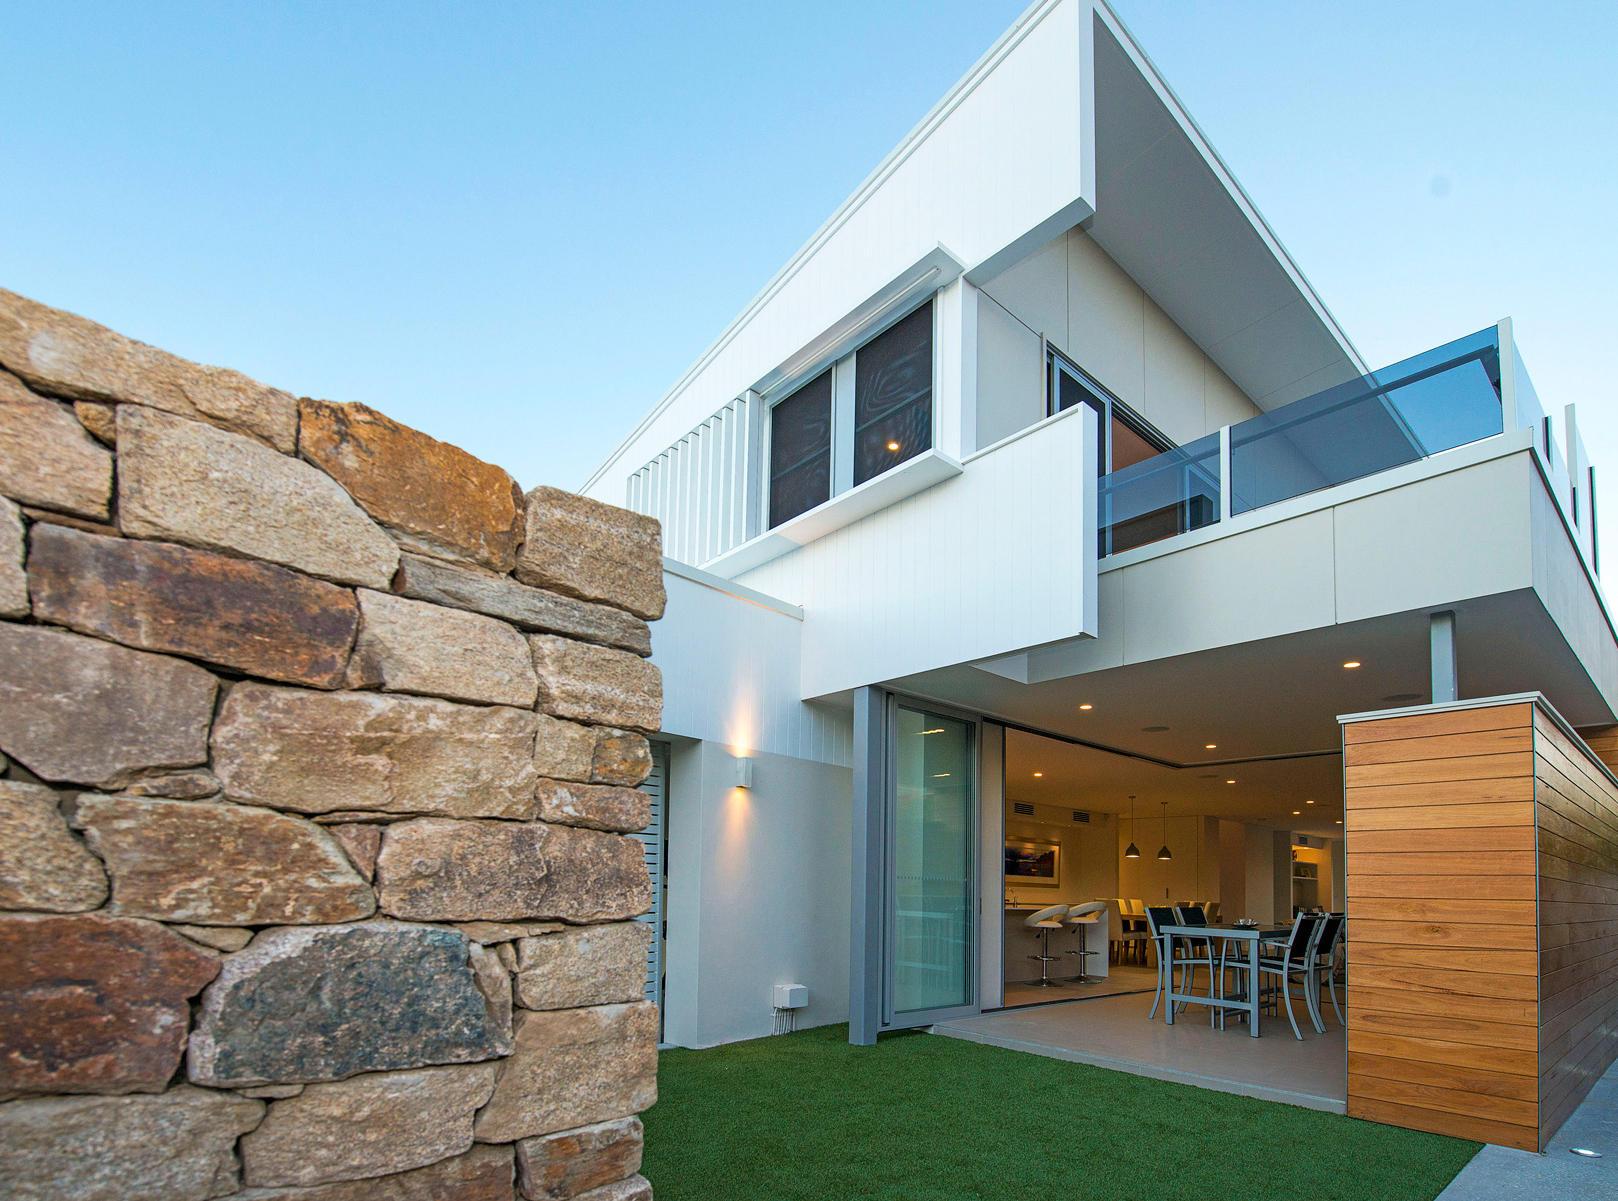 Innova Home innova projects luxury homes multi residential housing